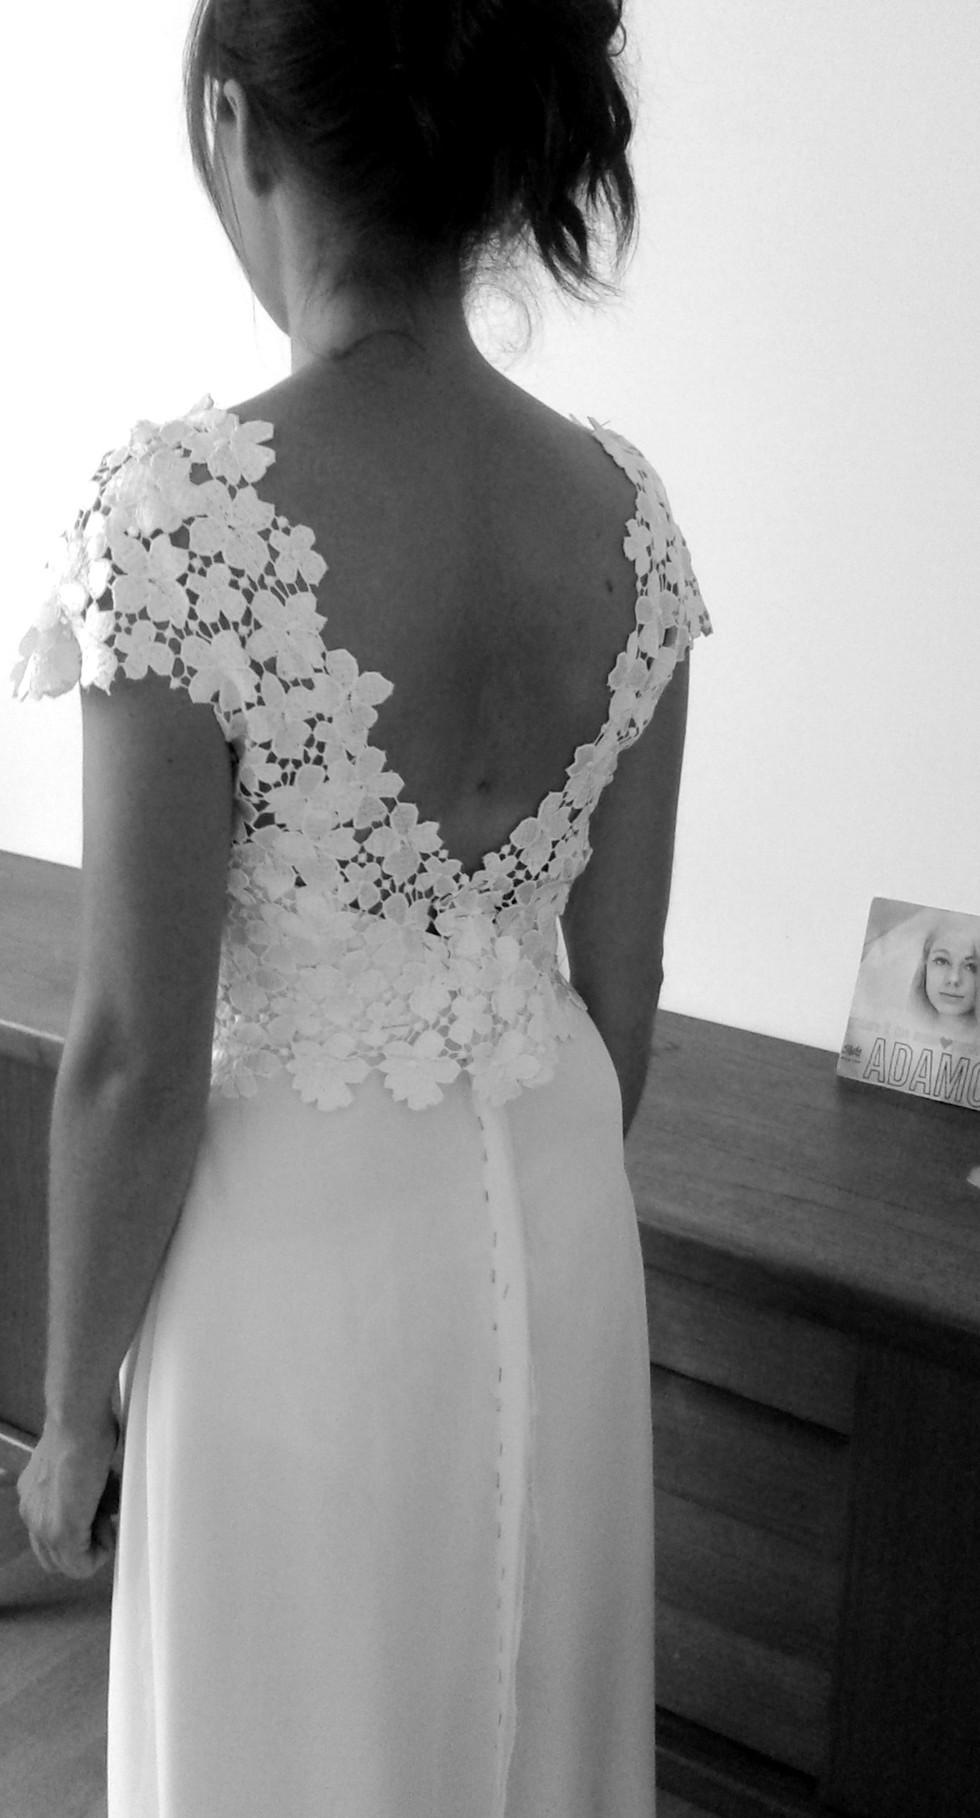 Kleid3_4_bearbeitet.jpg